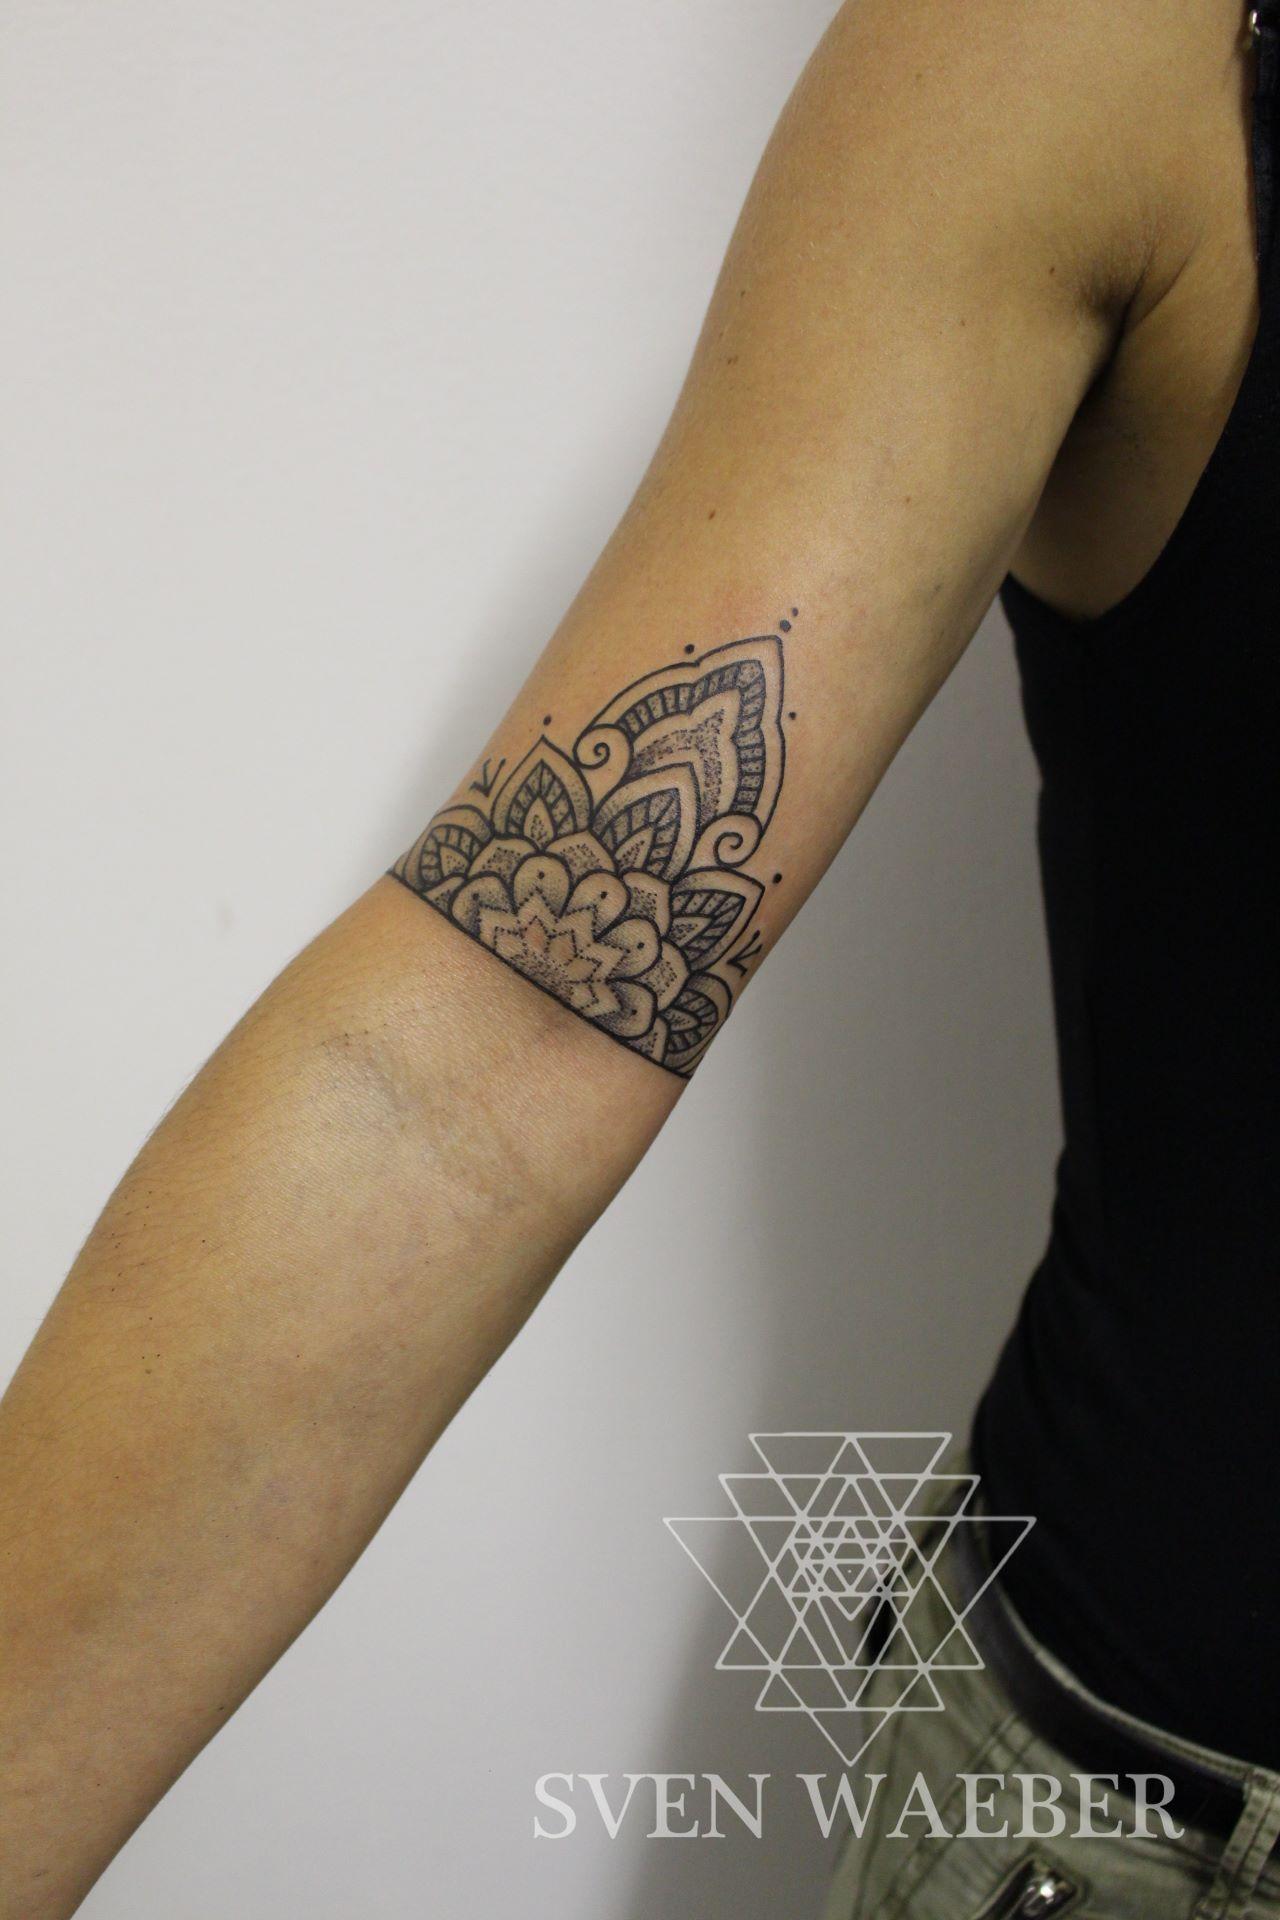 Pin By Erin Wiseman On Tattoo Tatouage Tatouage Femme Tatouage